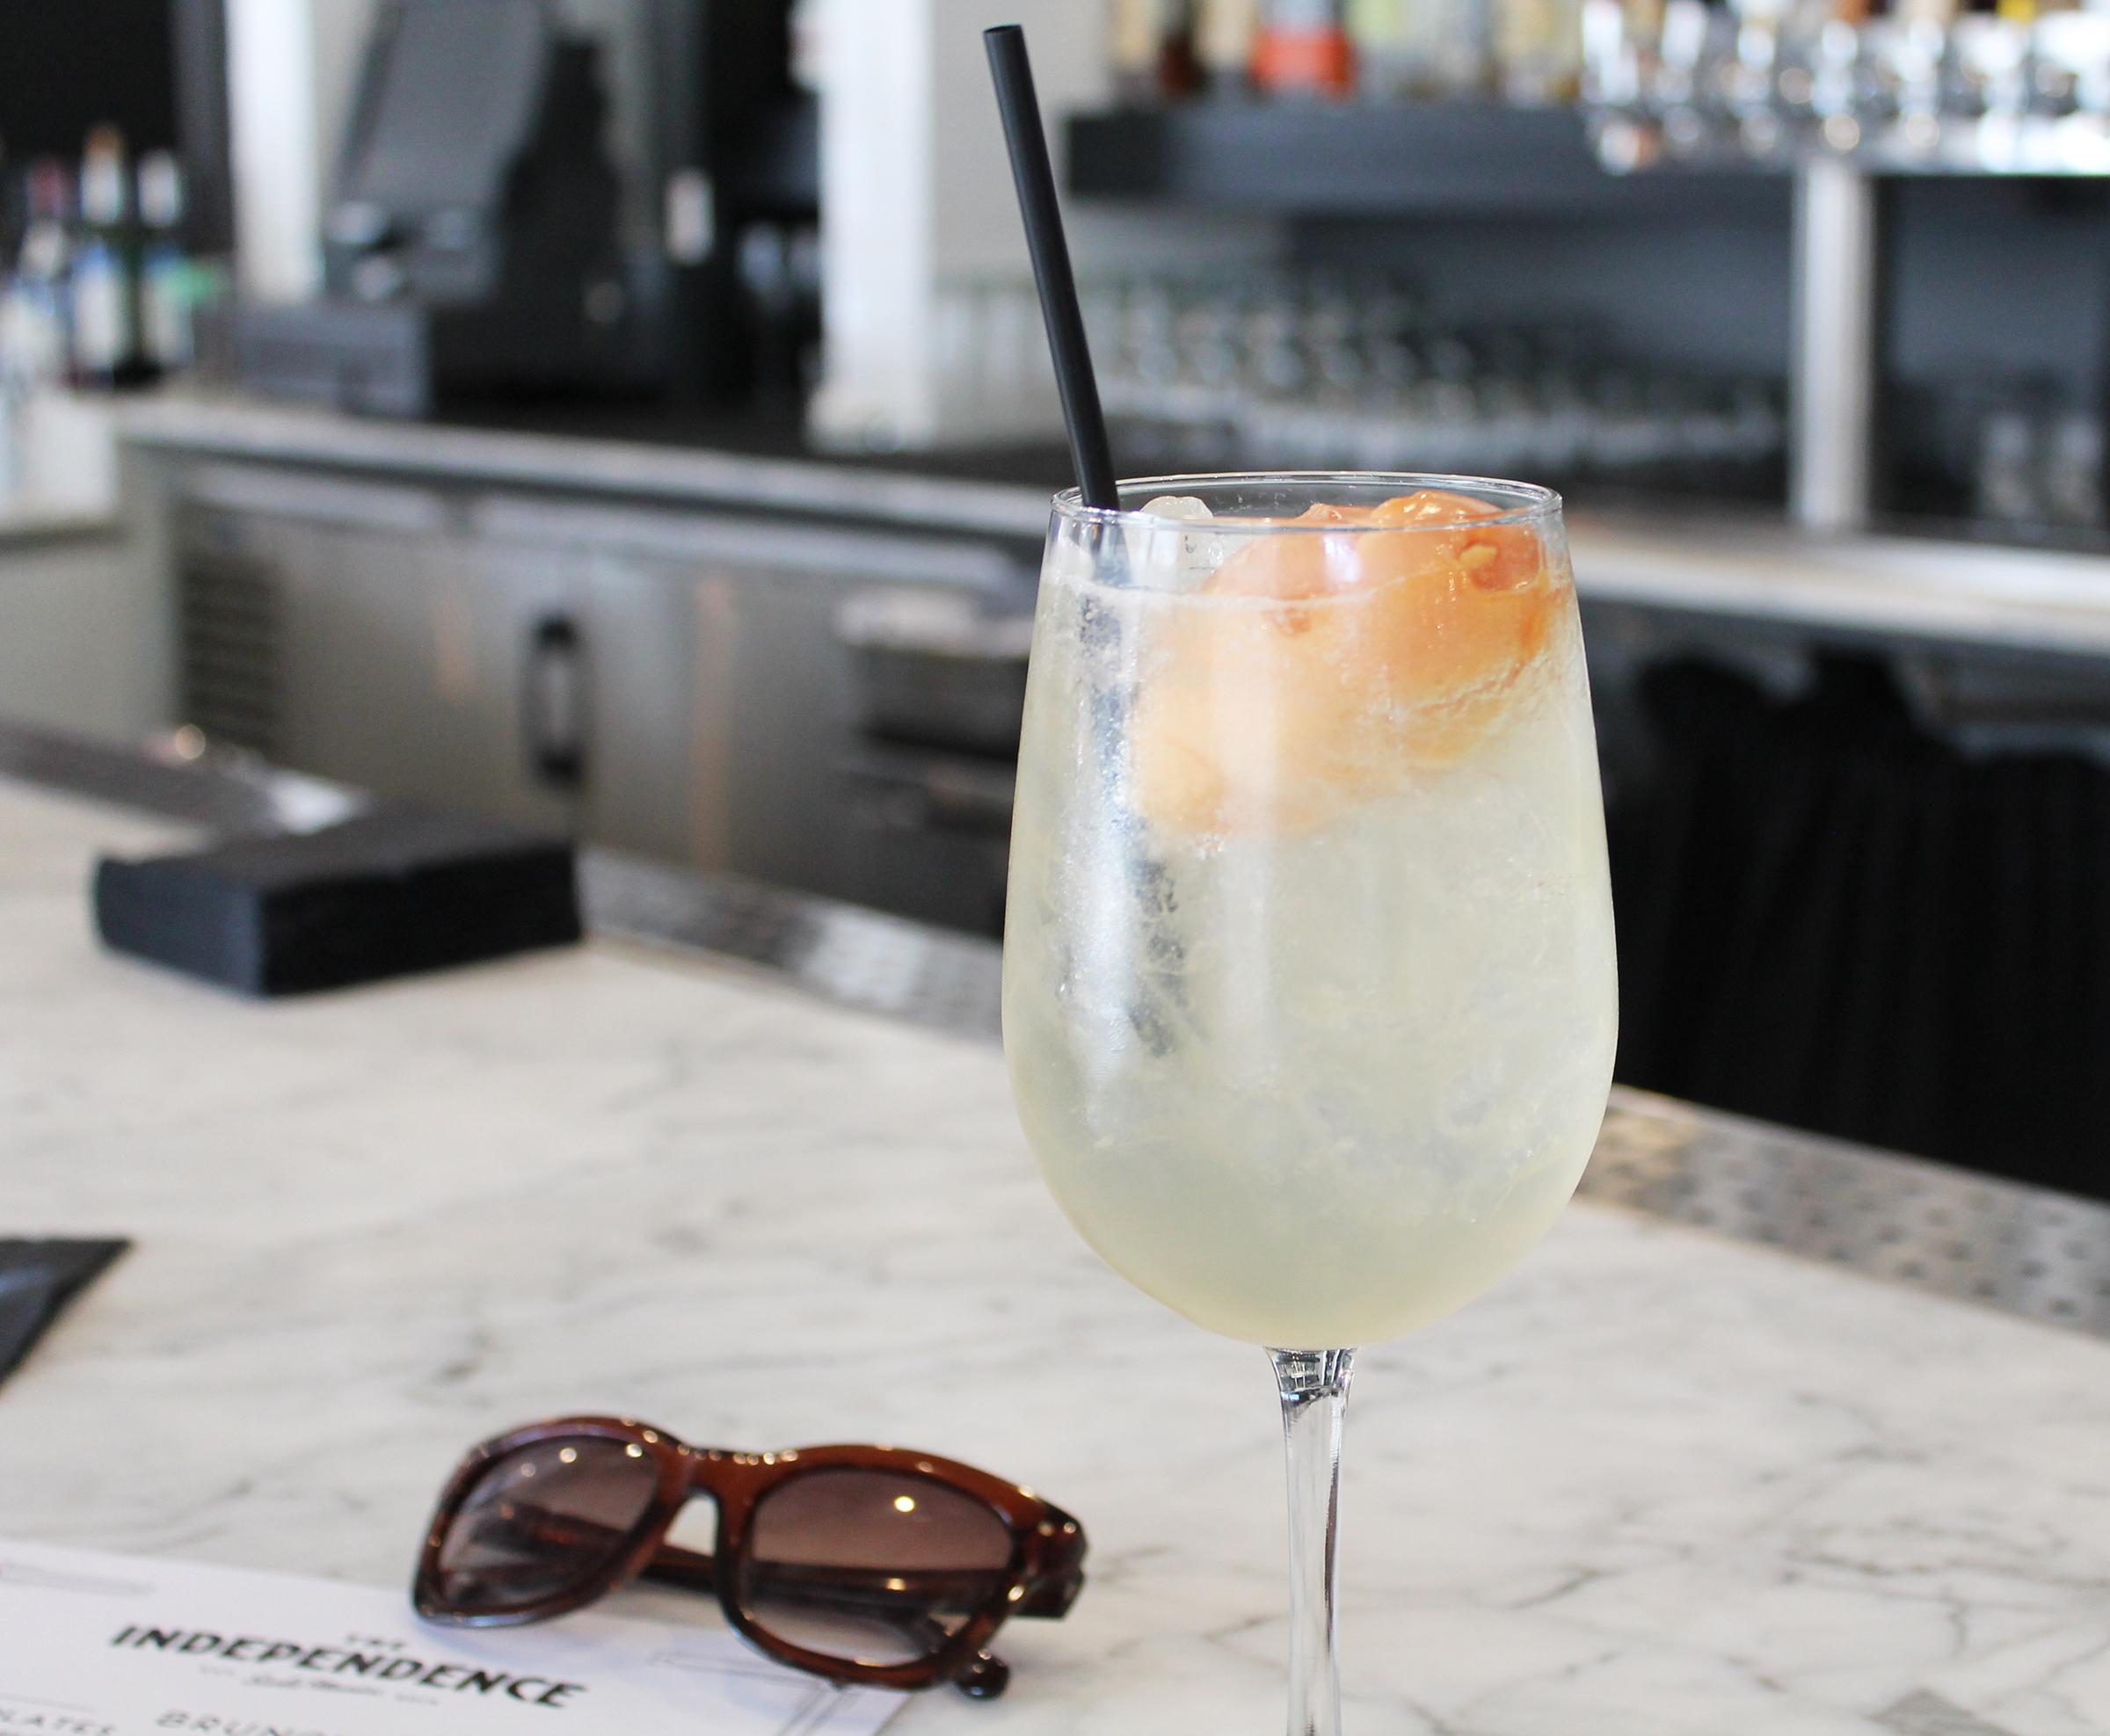 Blood Orange Bellini: Citron Vodka, Fresh Lemon Peach Liquor, Orange Sorbet, Sparkling Wine